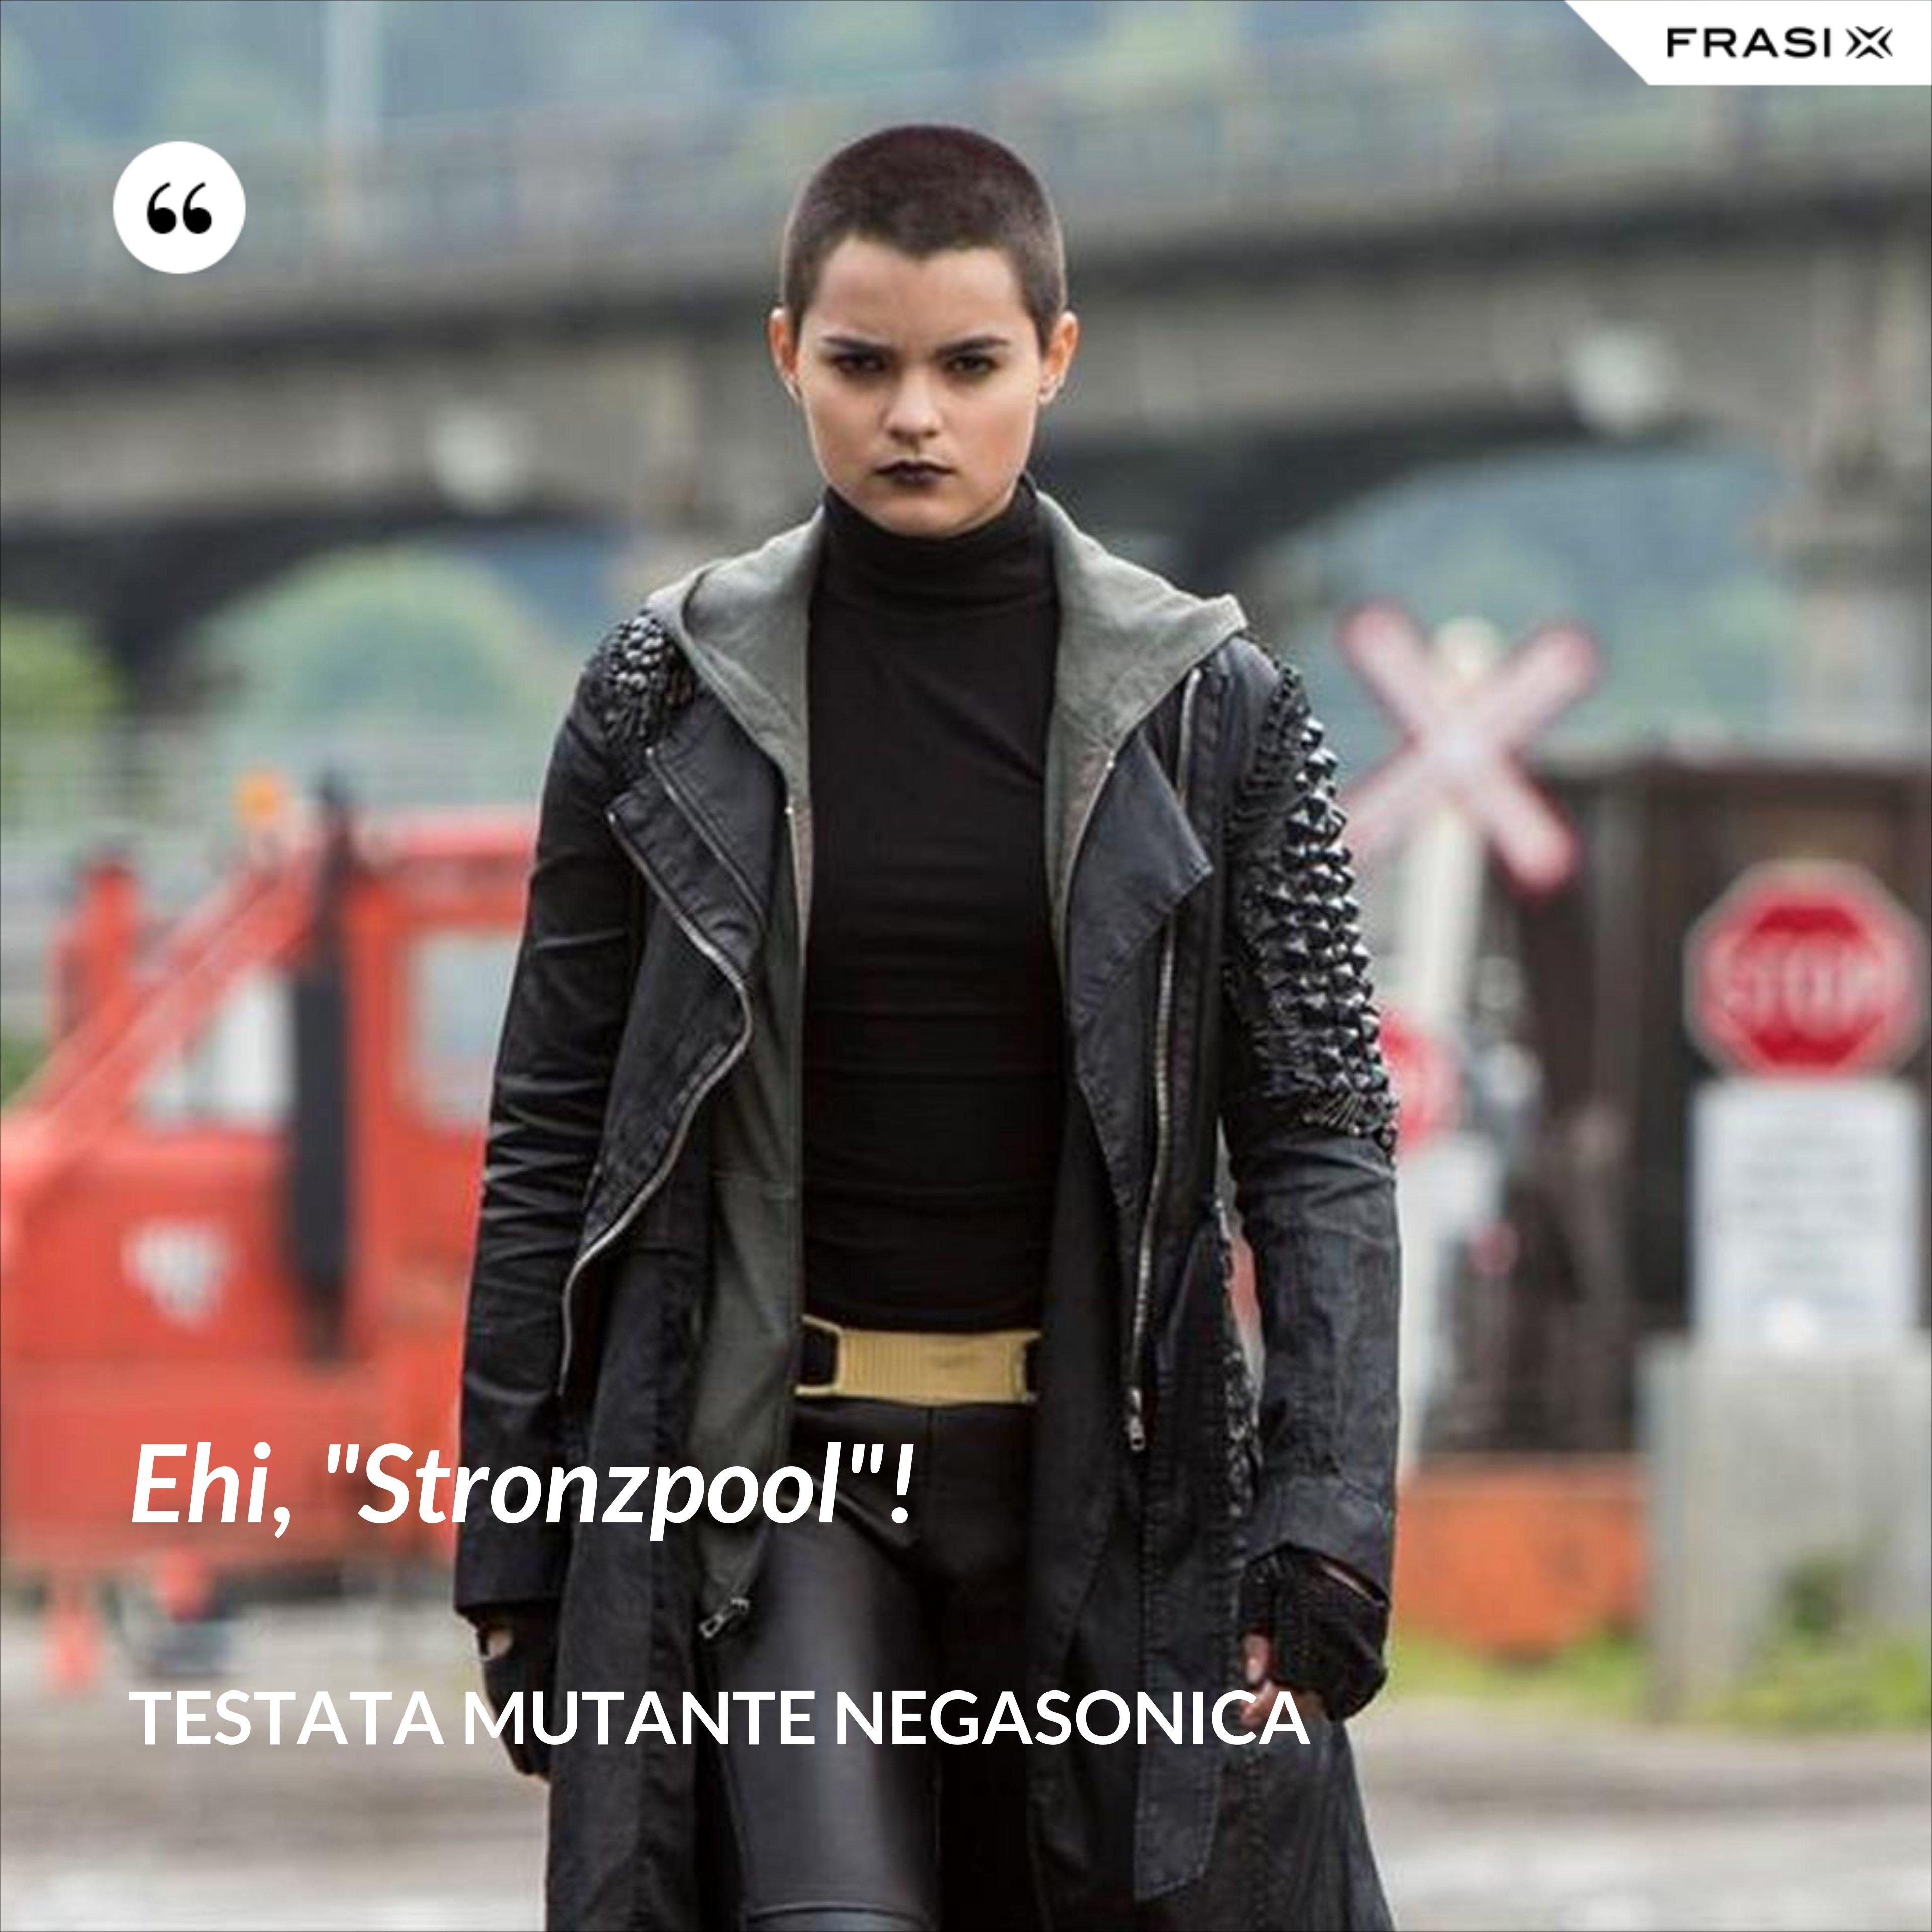 "Ehi, ""Stronzpool""! - Testata Mutante Negasonica"